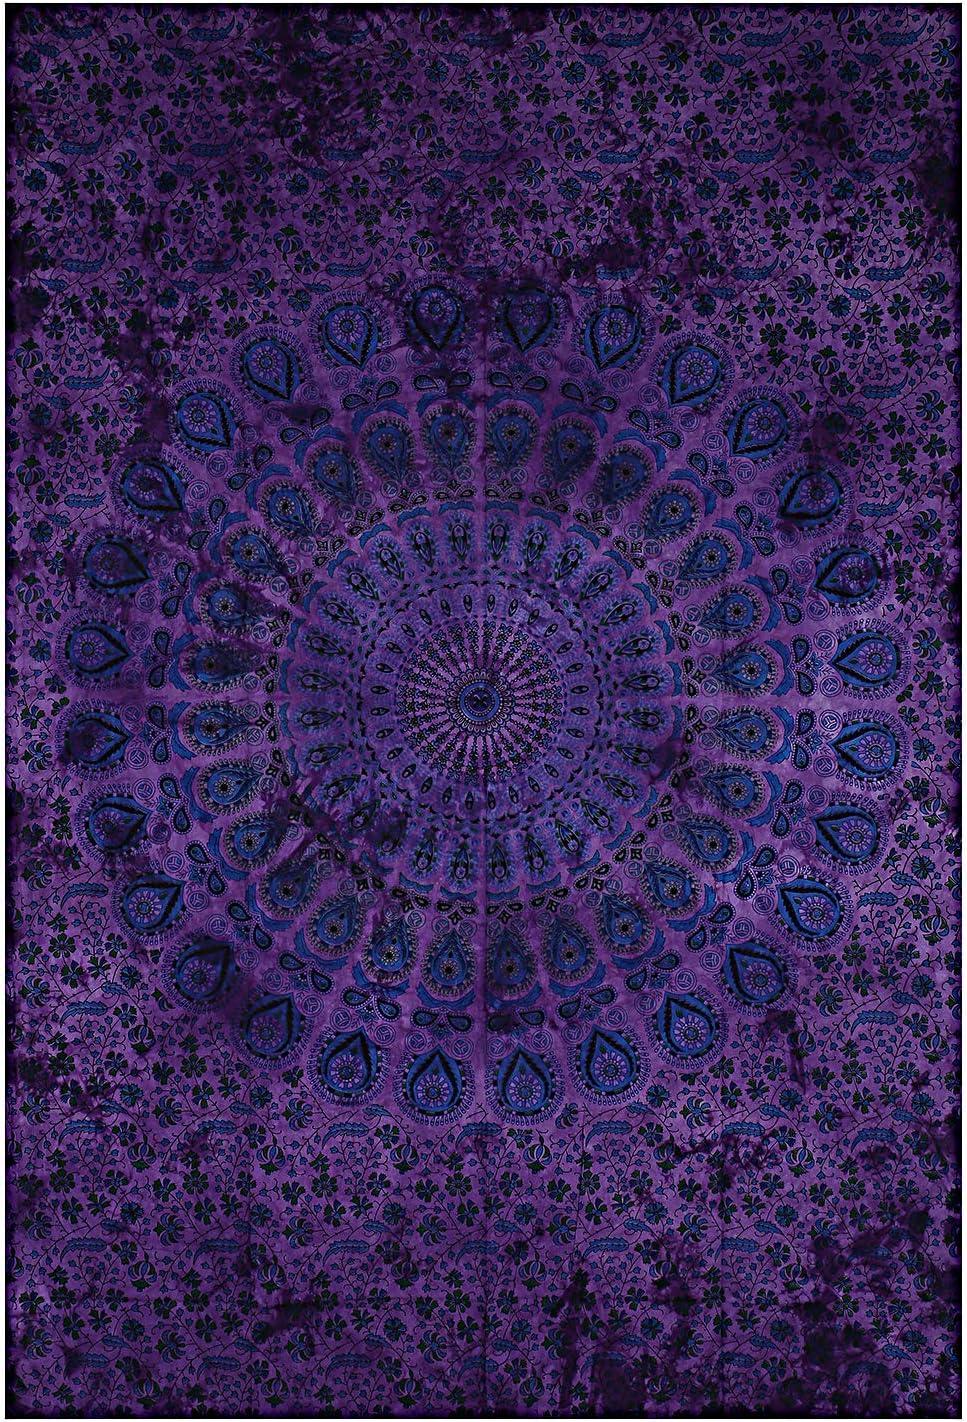 Montreal Tappassier Indian Wall Decor Hippie Tie Dye Tapestries Bohemian Mandala Tapestry Wall Hanging Throw (Purple Dye)